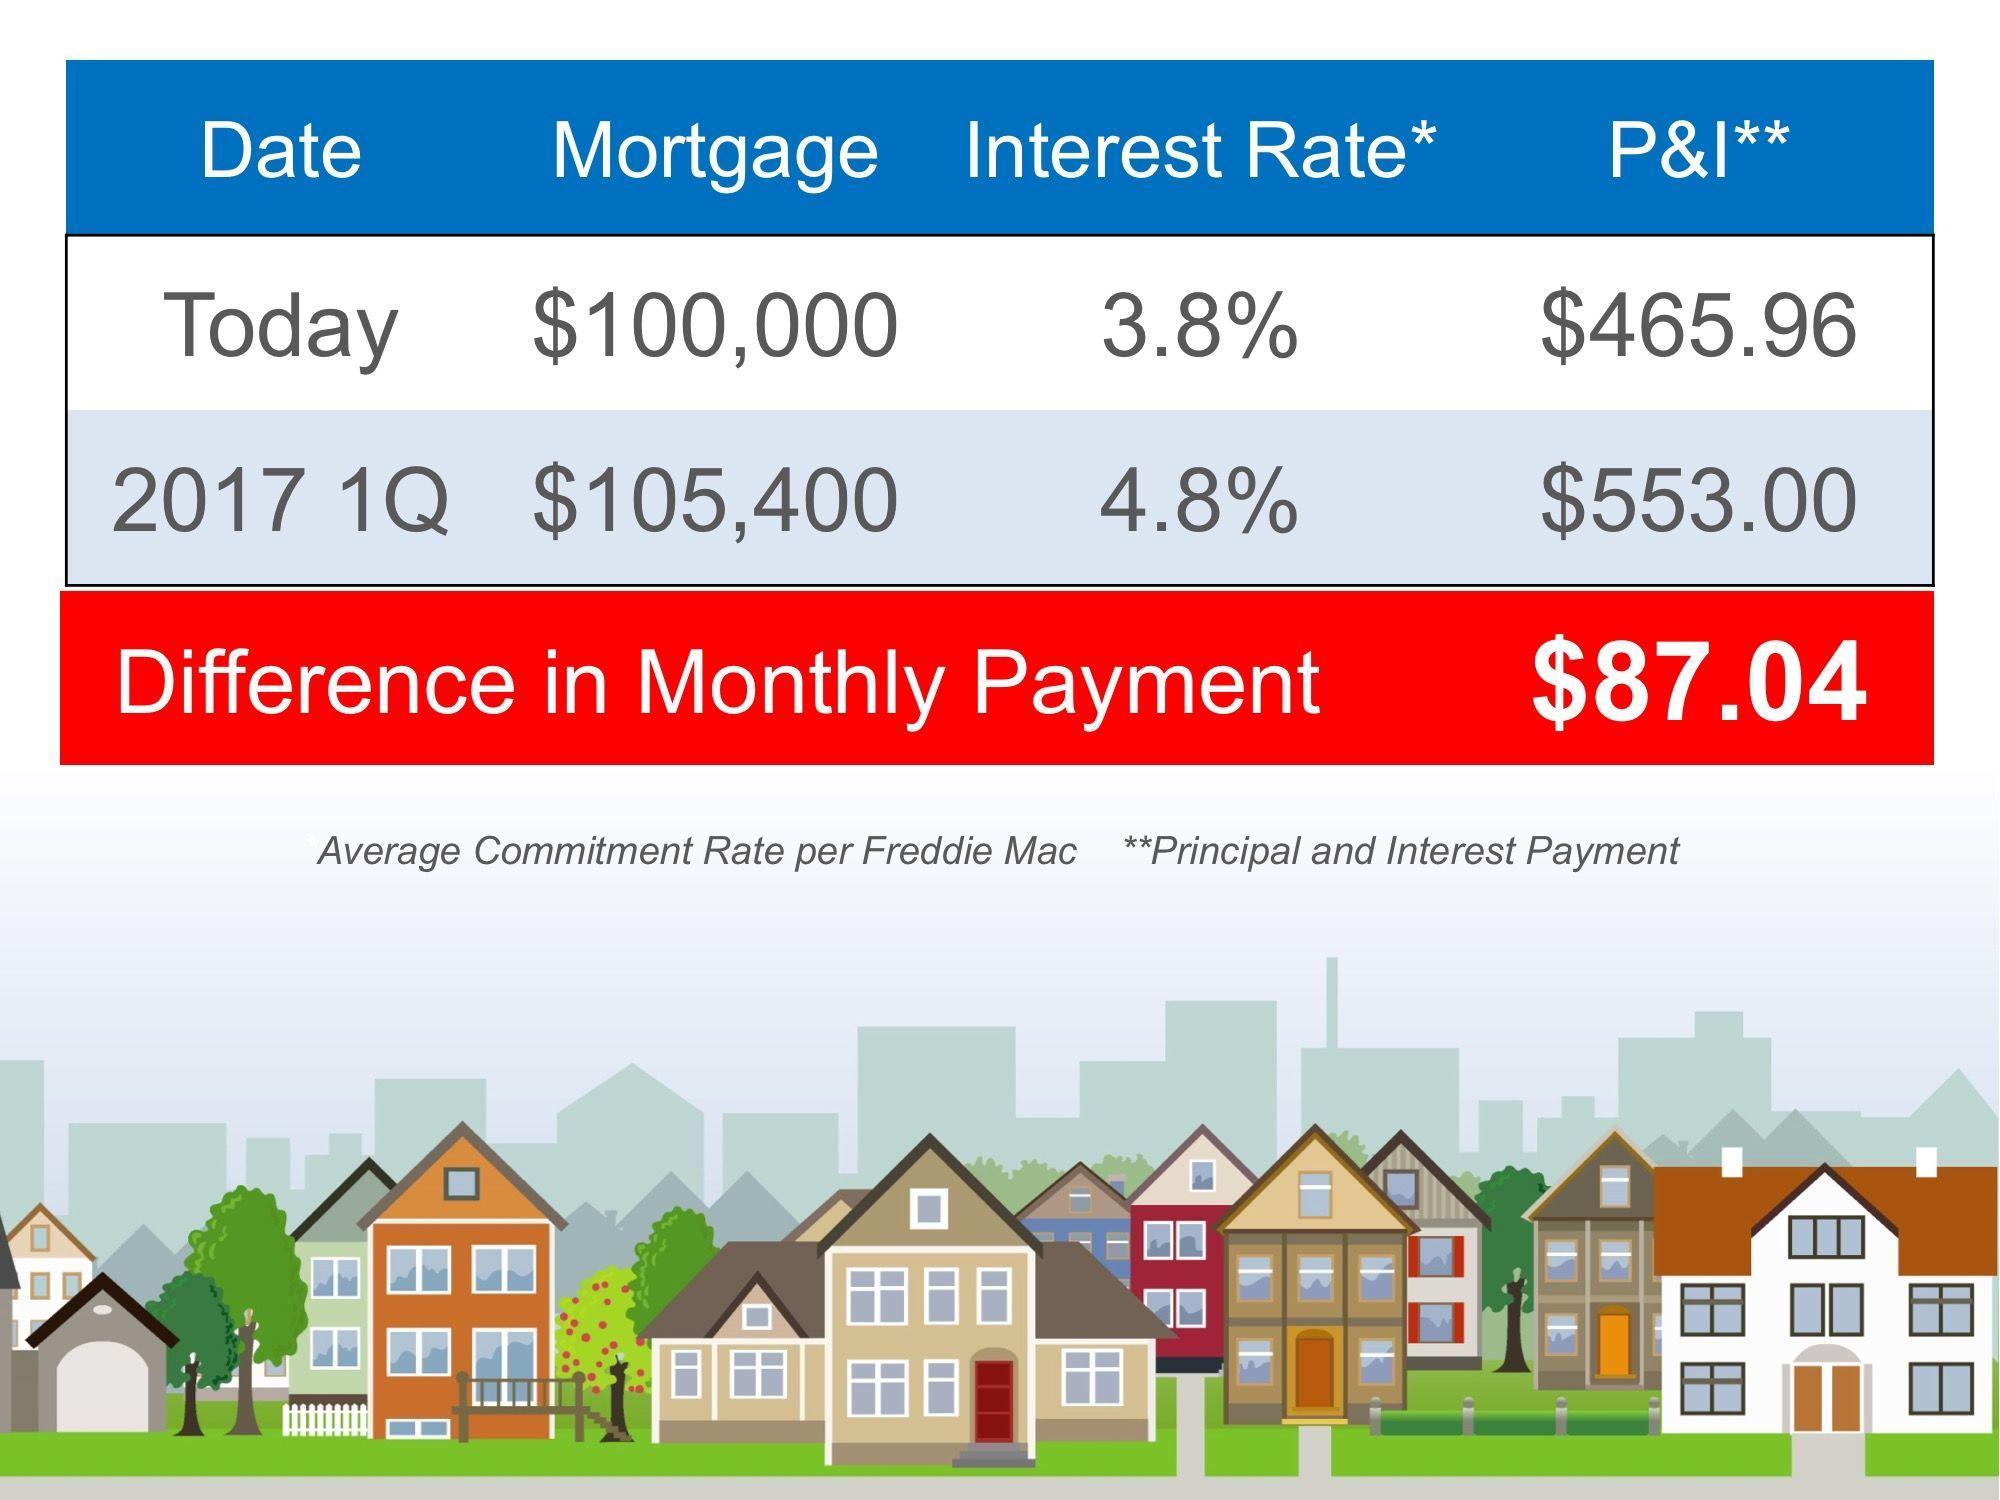 Mortgage Broker Branding Mortgage Broker Canada Mortgage Lender First Time Mortgage Broker Advertising In 2020 Mortgage Mortgage Payment Mortgage Interest Rates